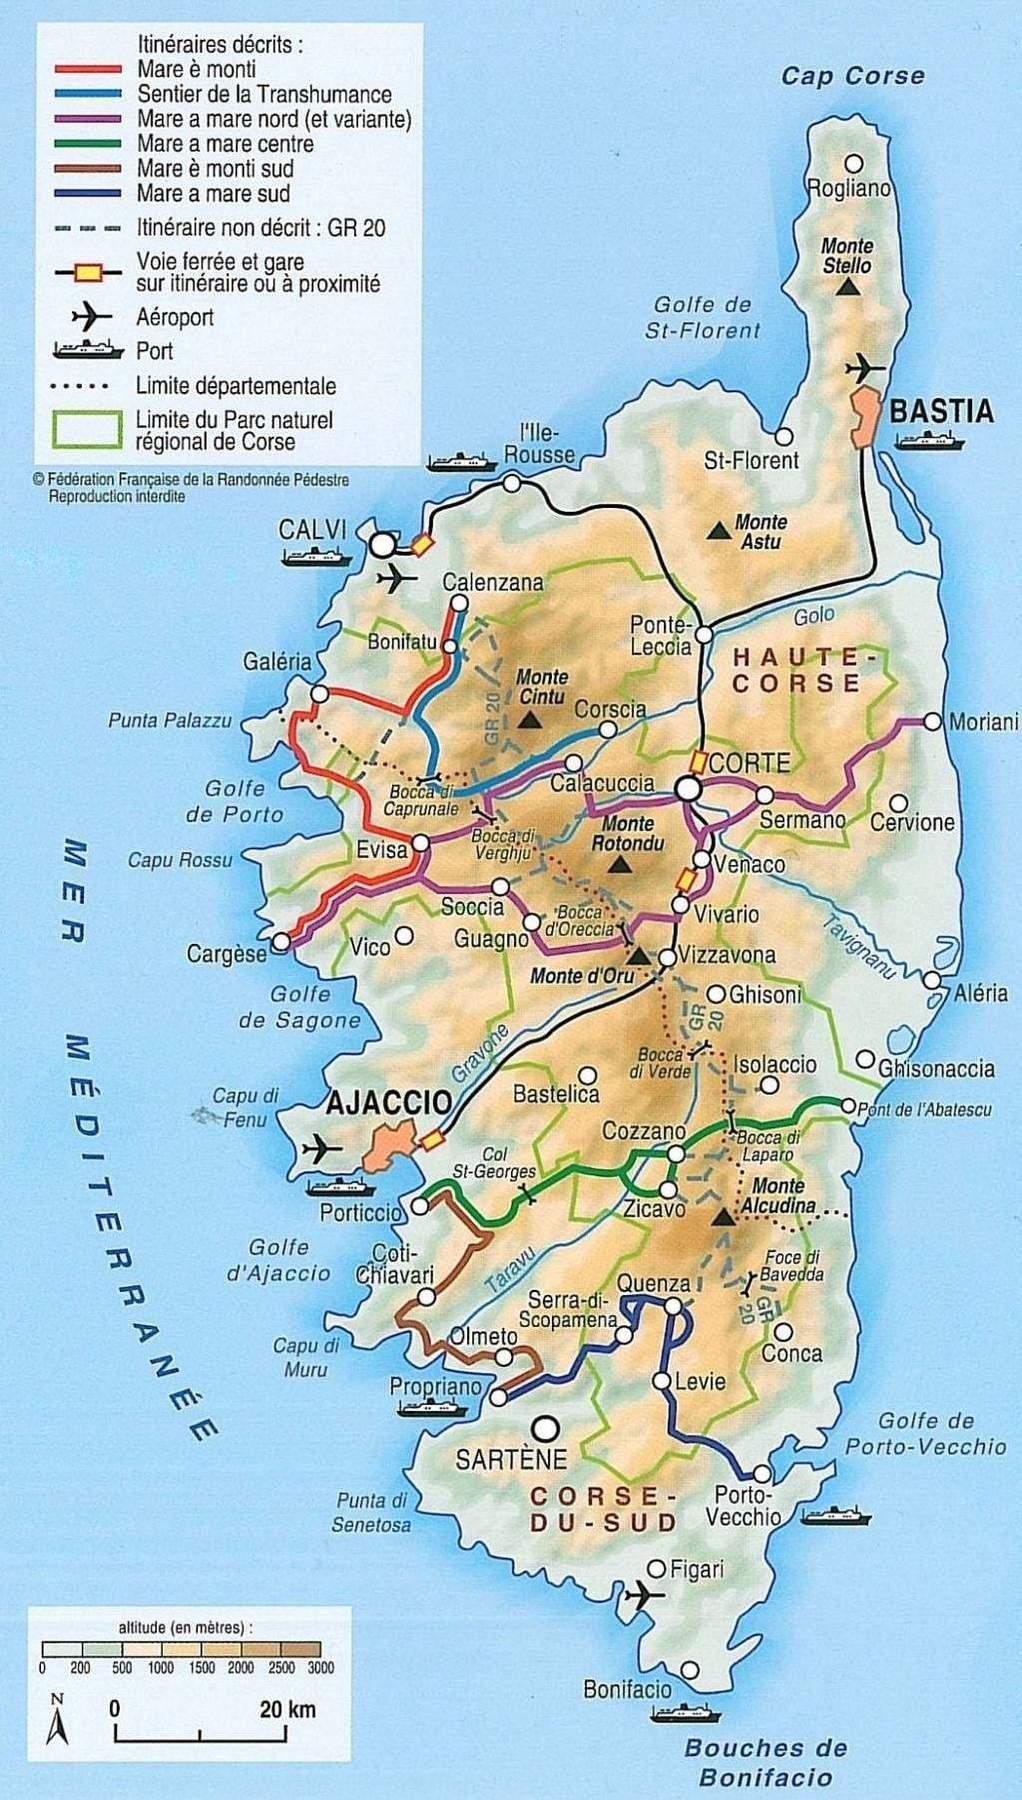 Carte Corse Marignana.Mare E Monti Informations Etapes Materiels Carnet De Route